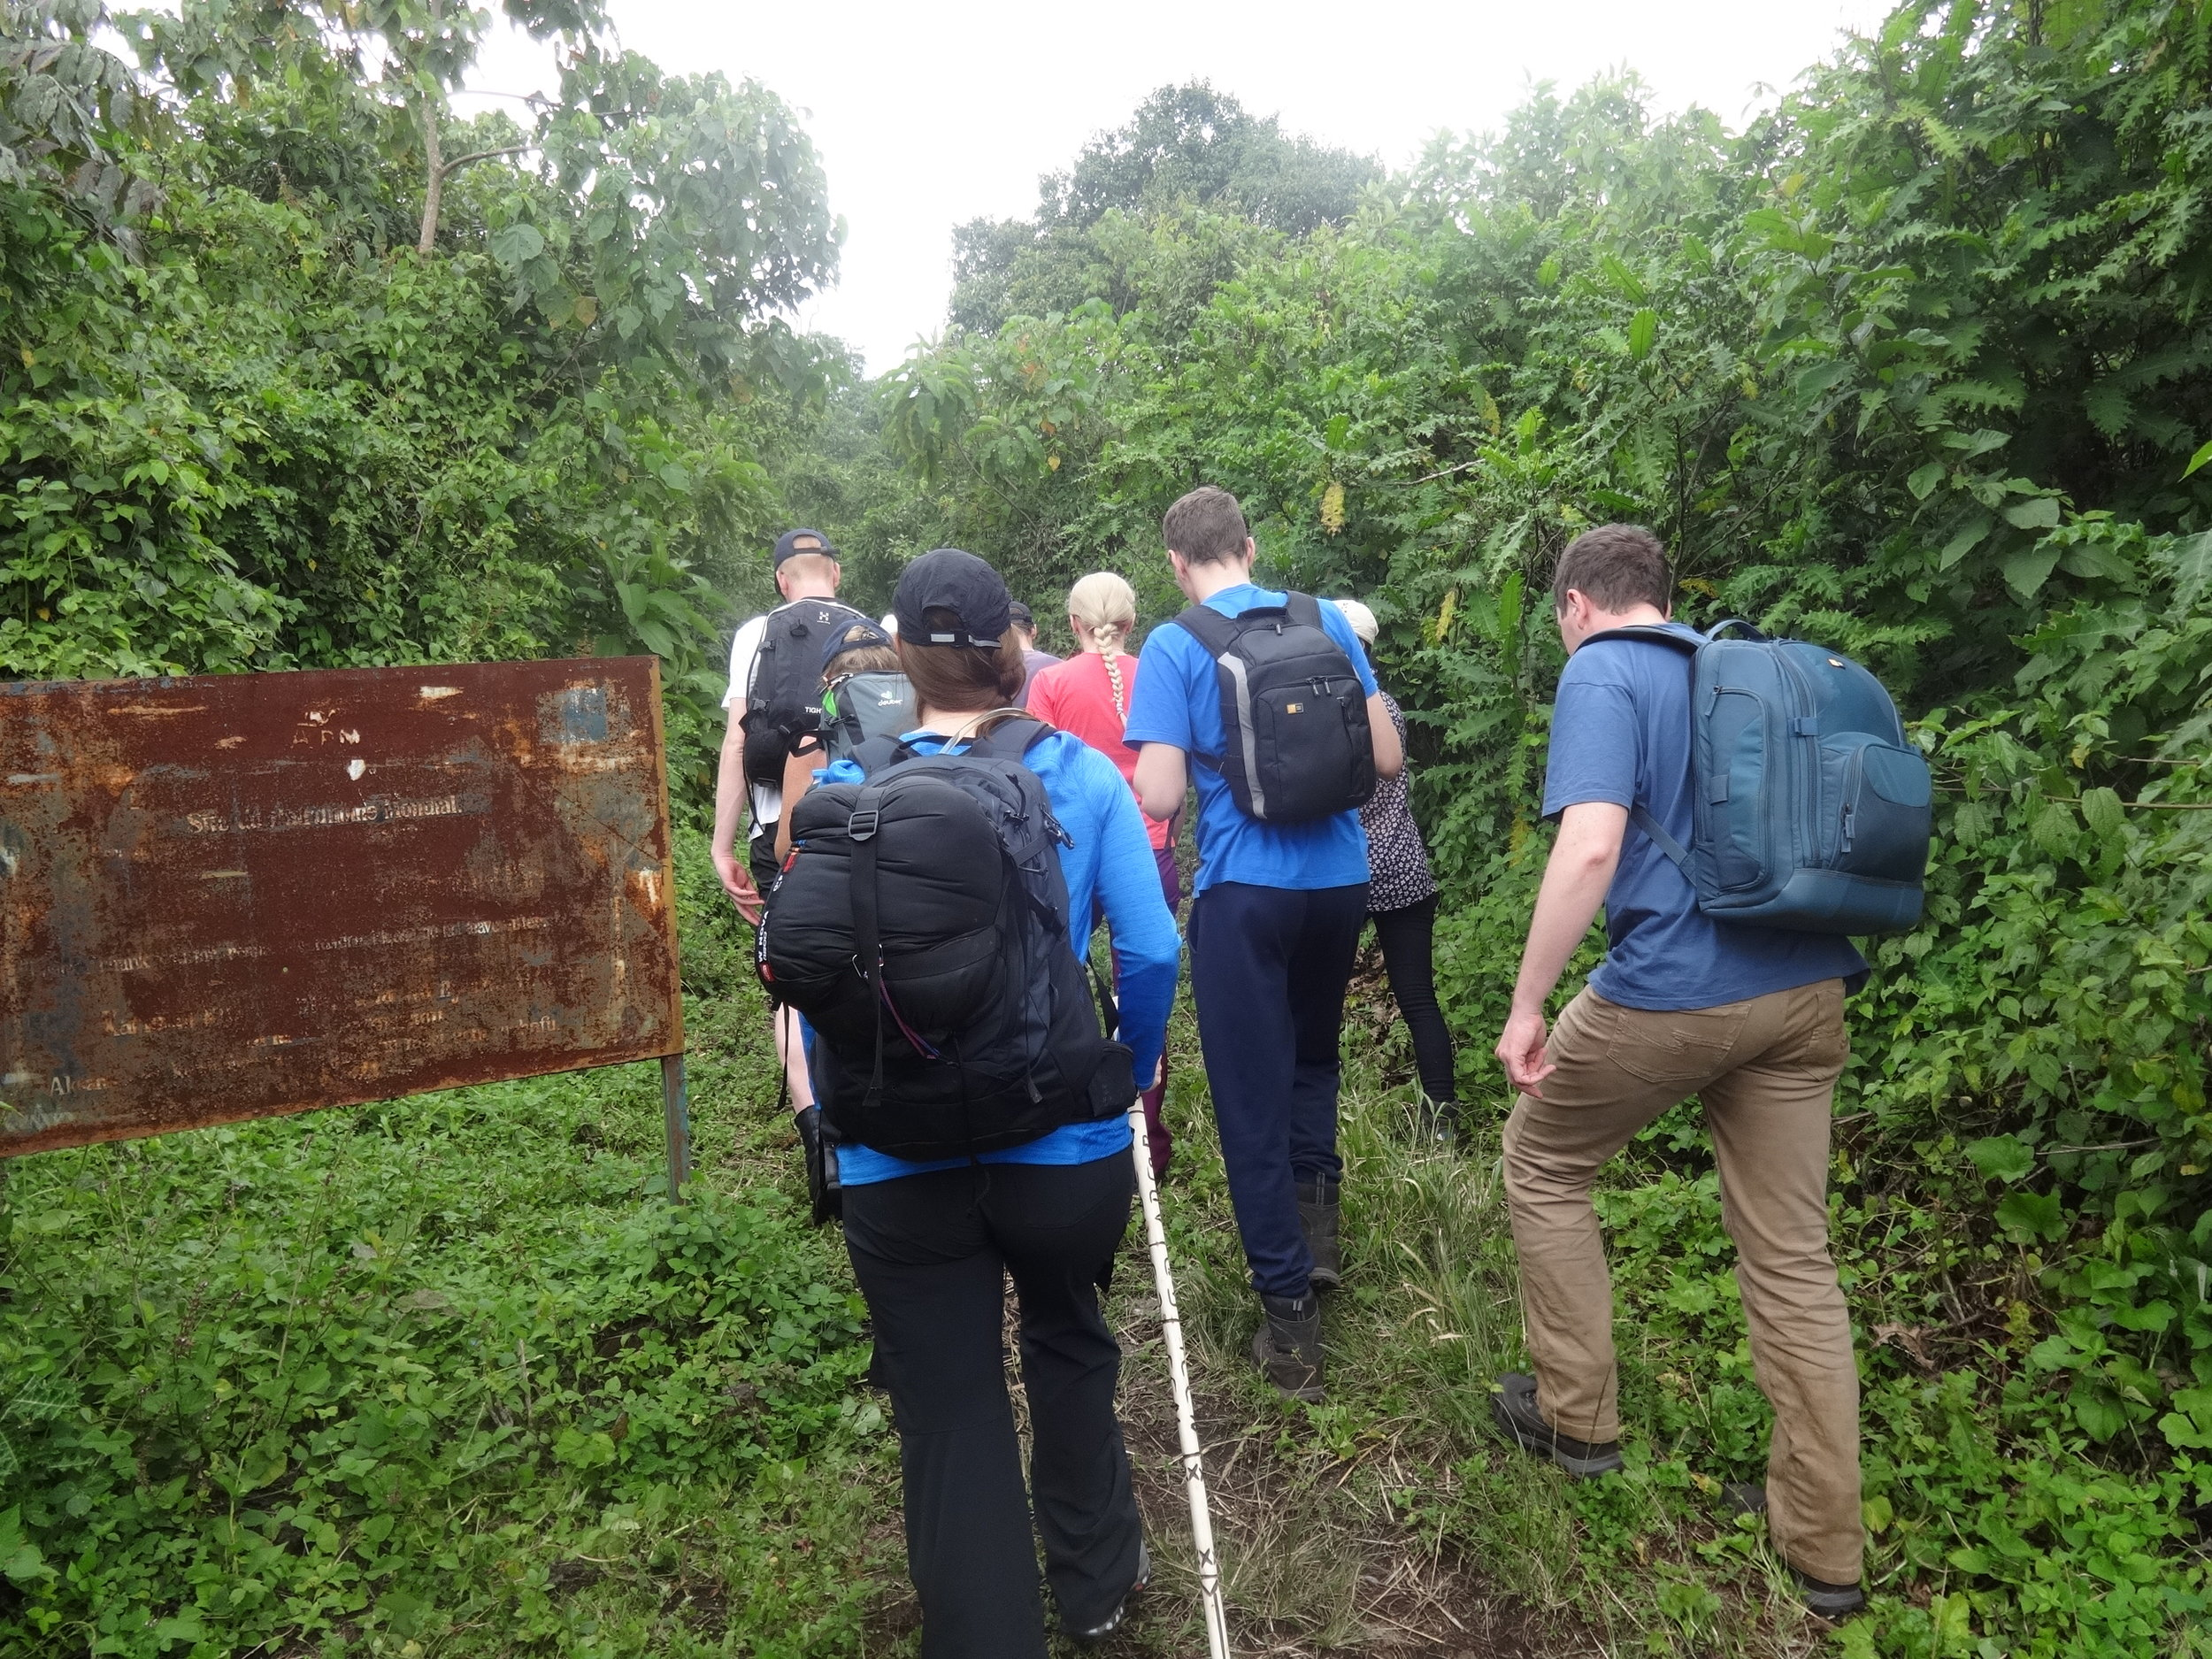 Well packaged tourist on Nyiragongo mountain hiking in D.R.Congo at Kibaati.